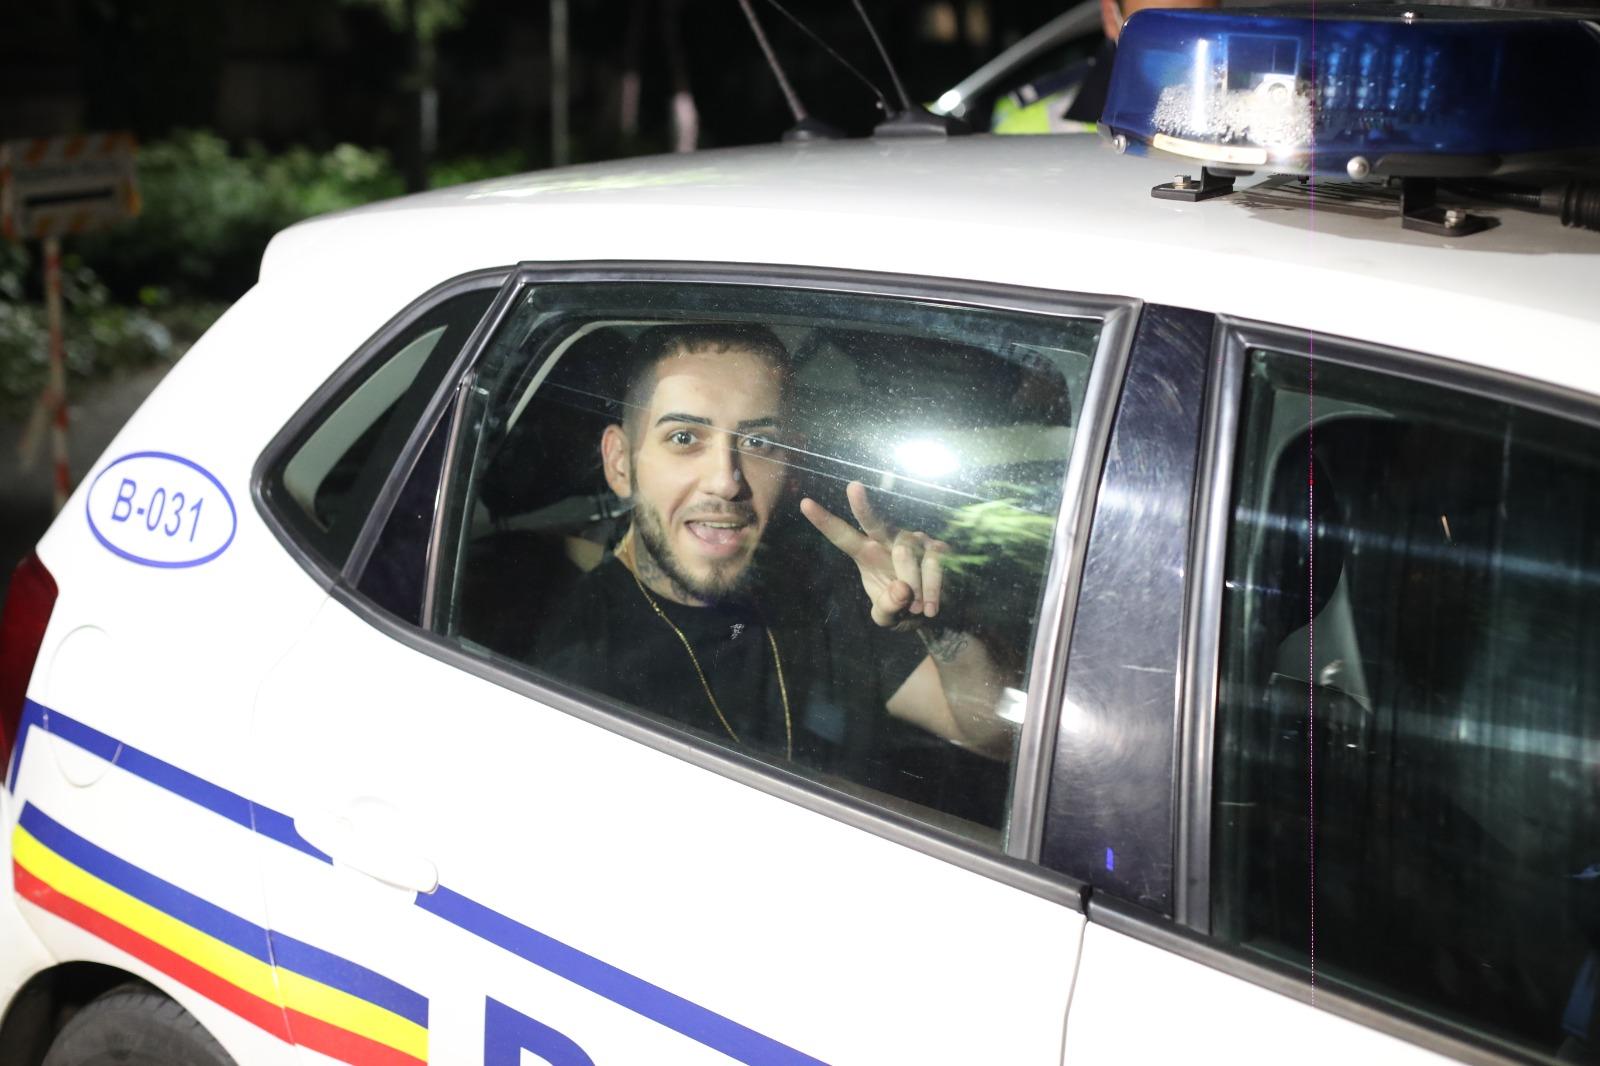 Fulgy a fost reținut de poliție, ar fi lovit un jurnalist și i-a furat telefonul mobil